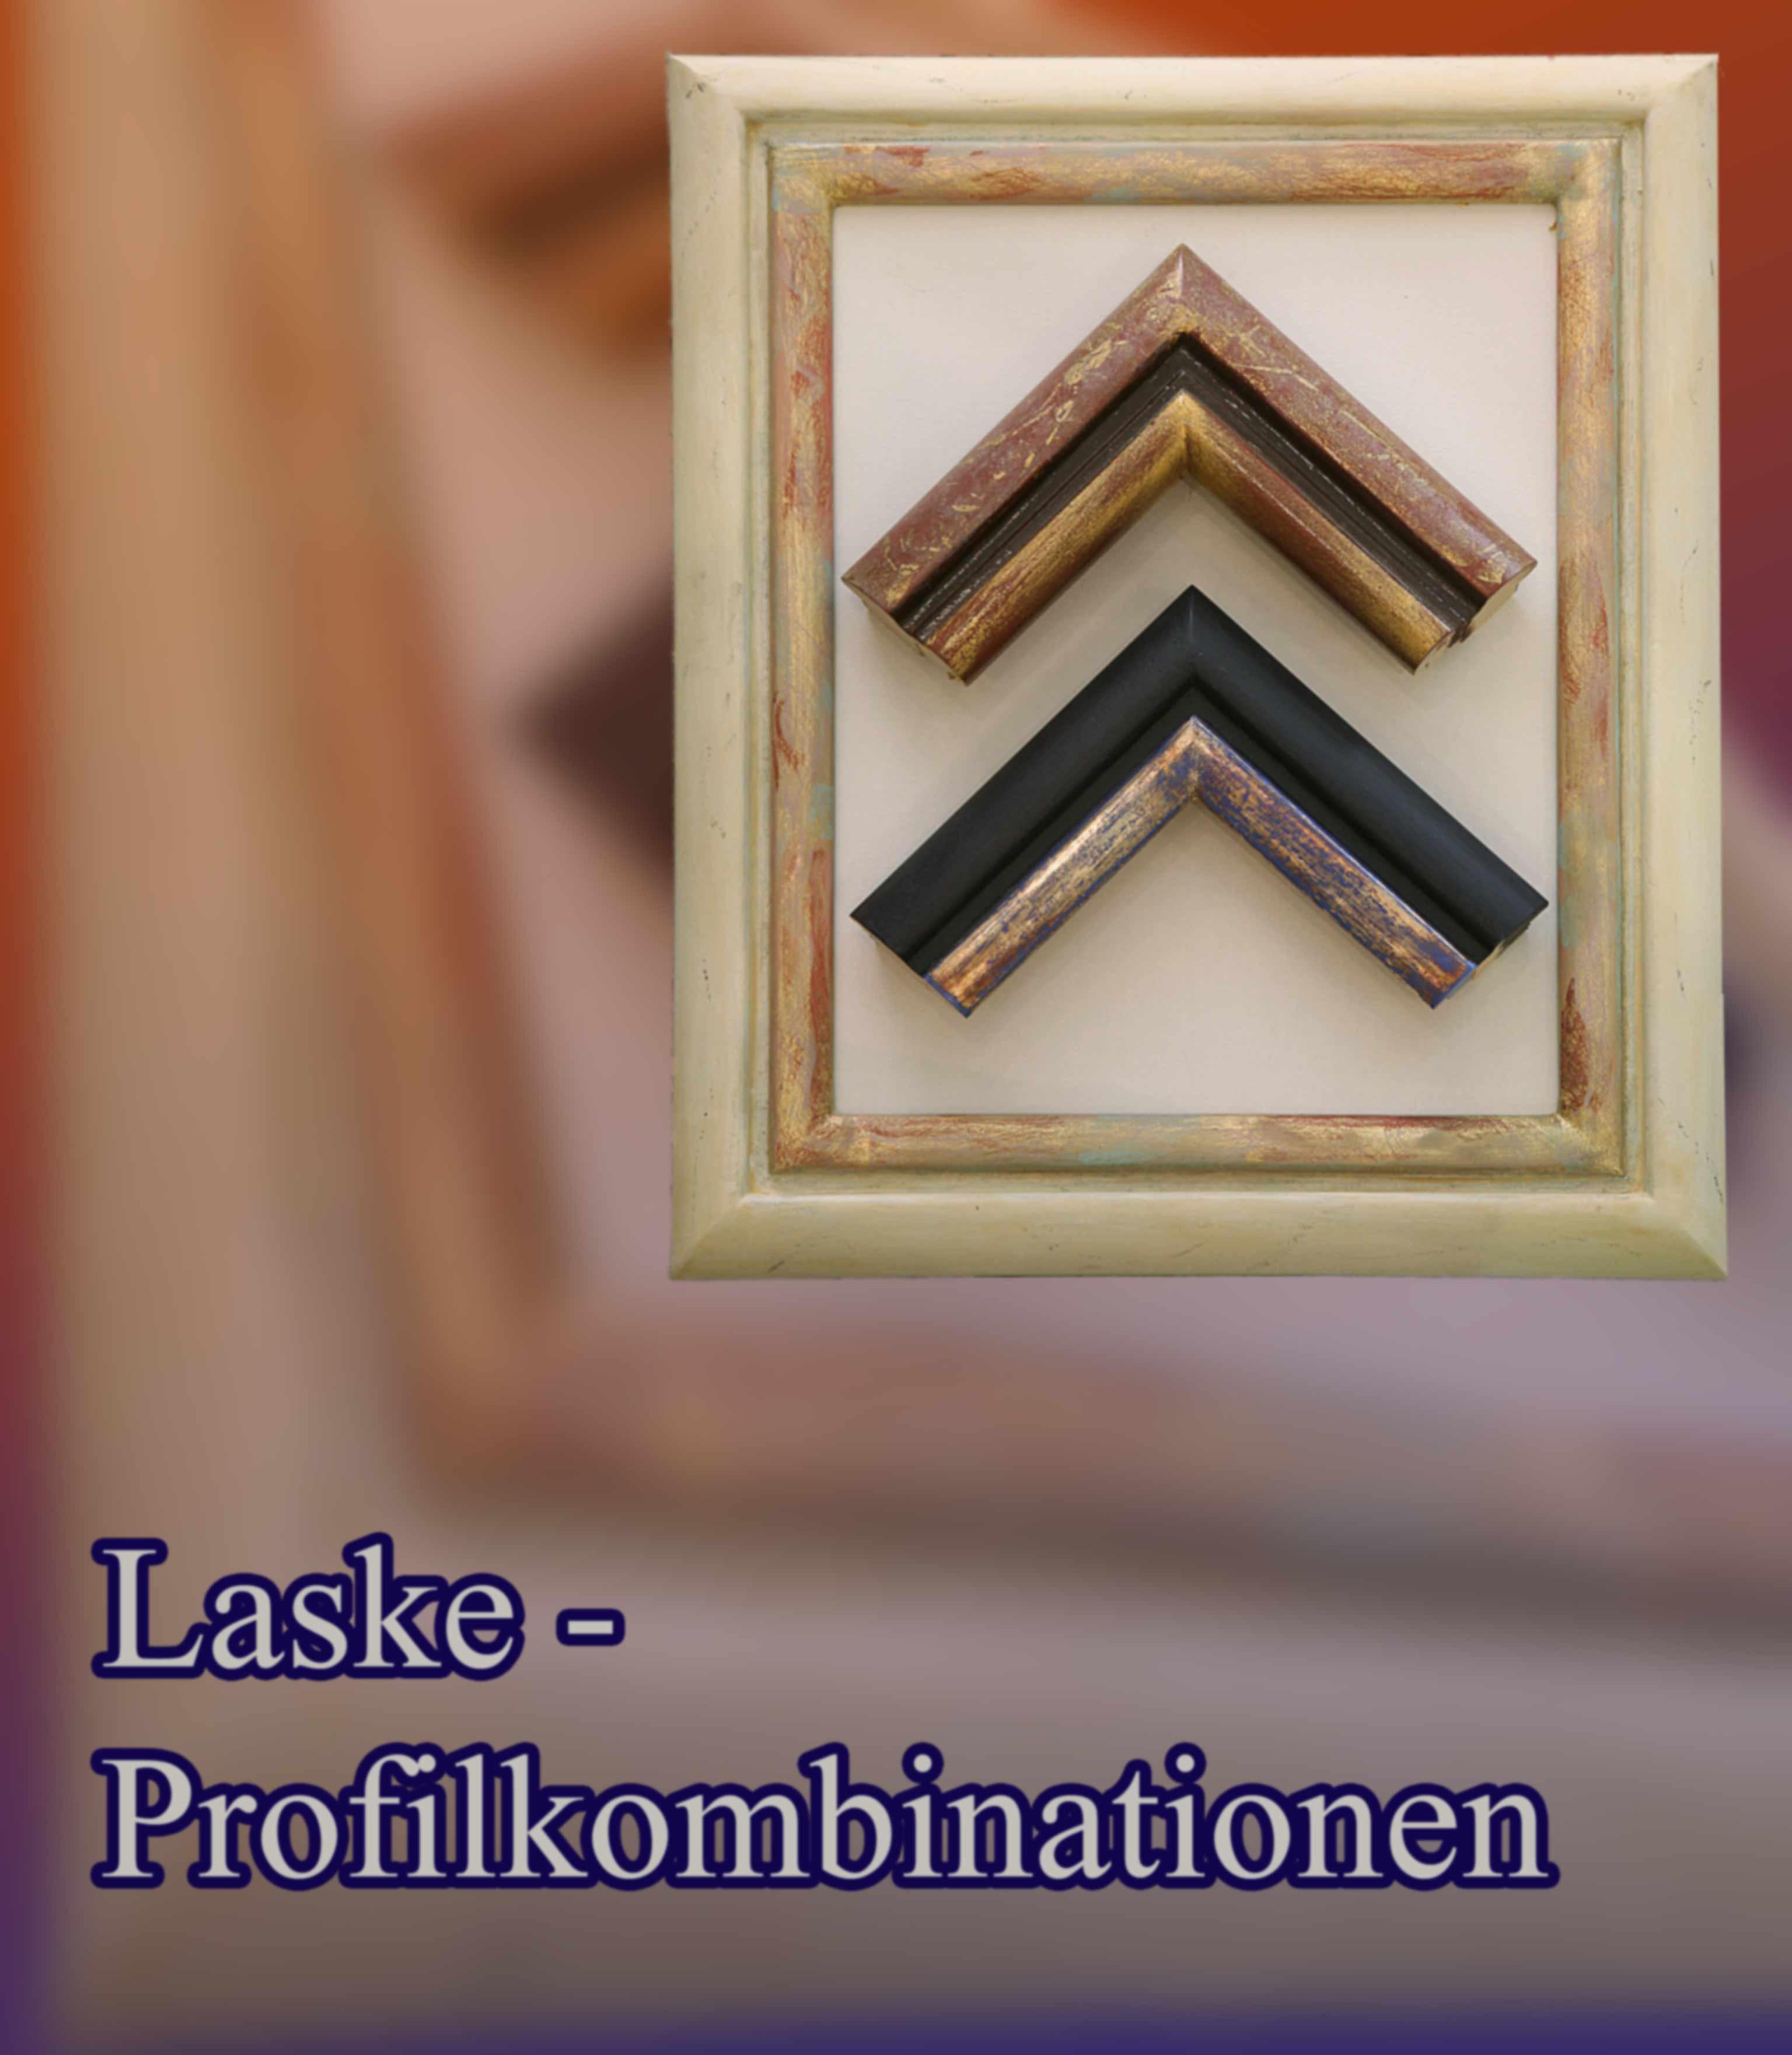 Original Laske Profilkombination